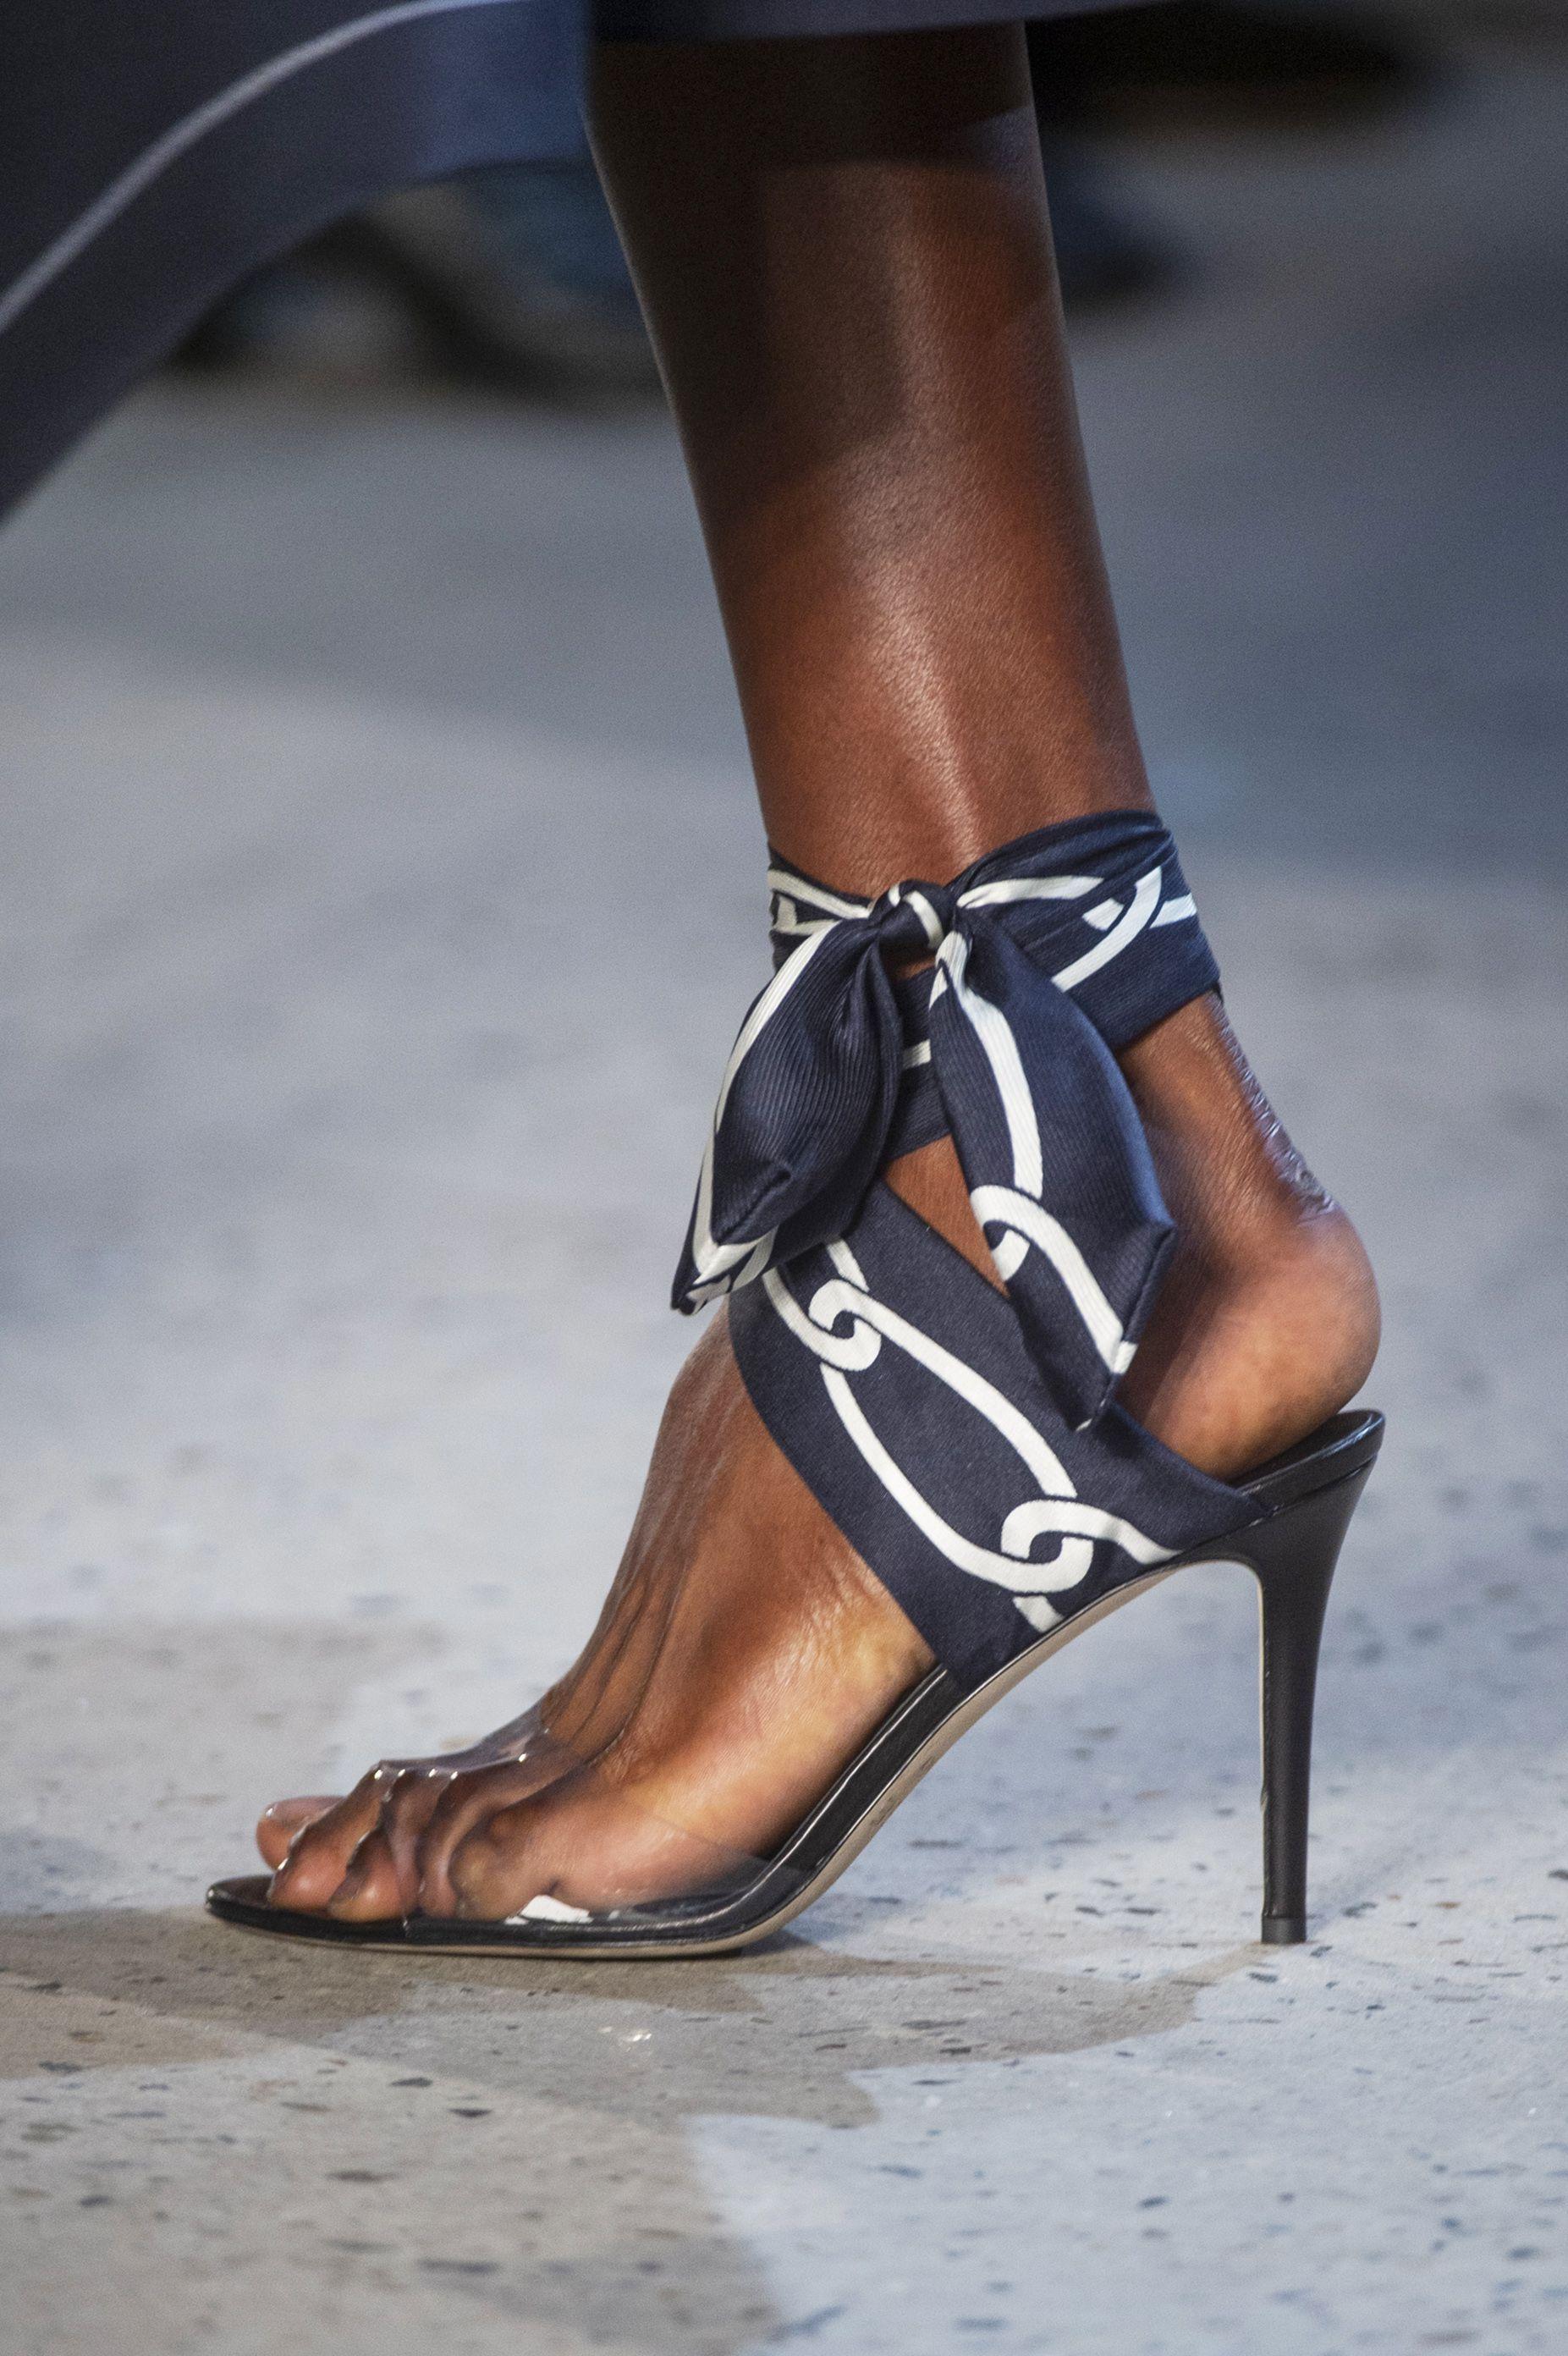 Runway shoes